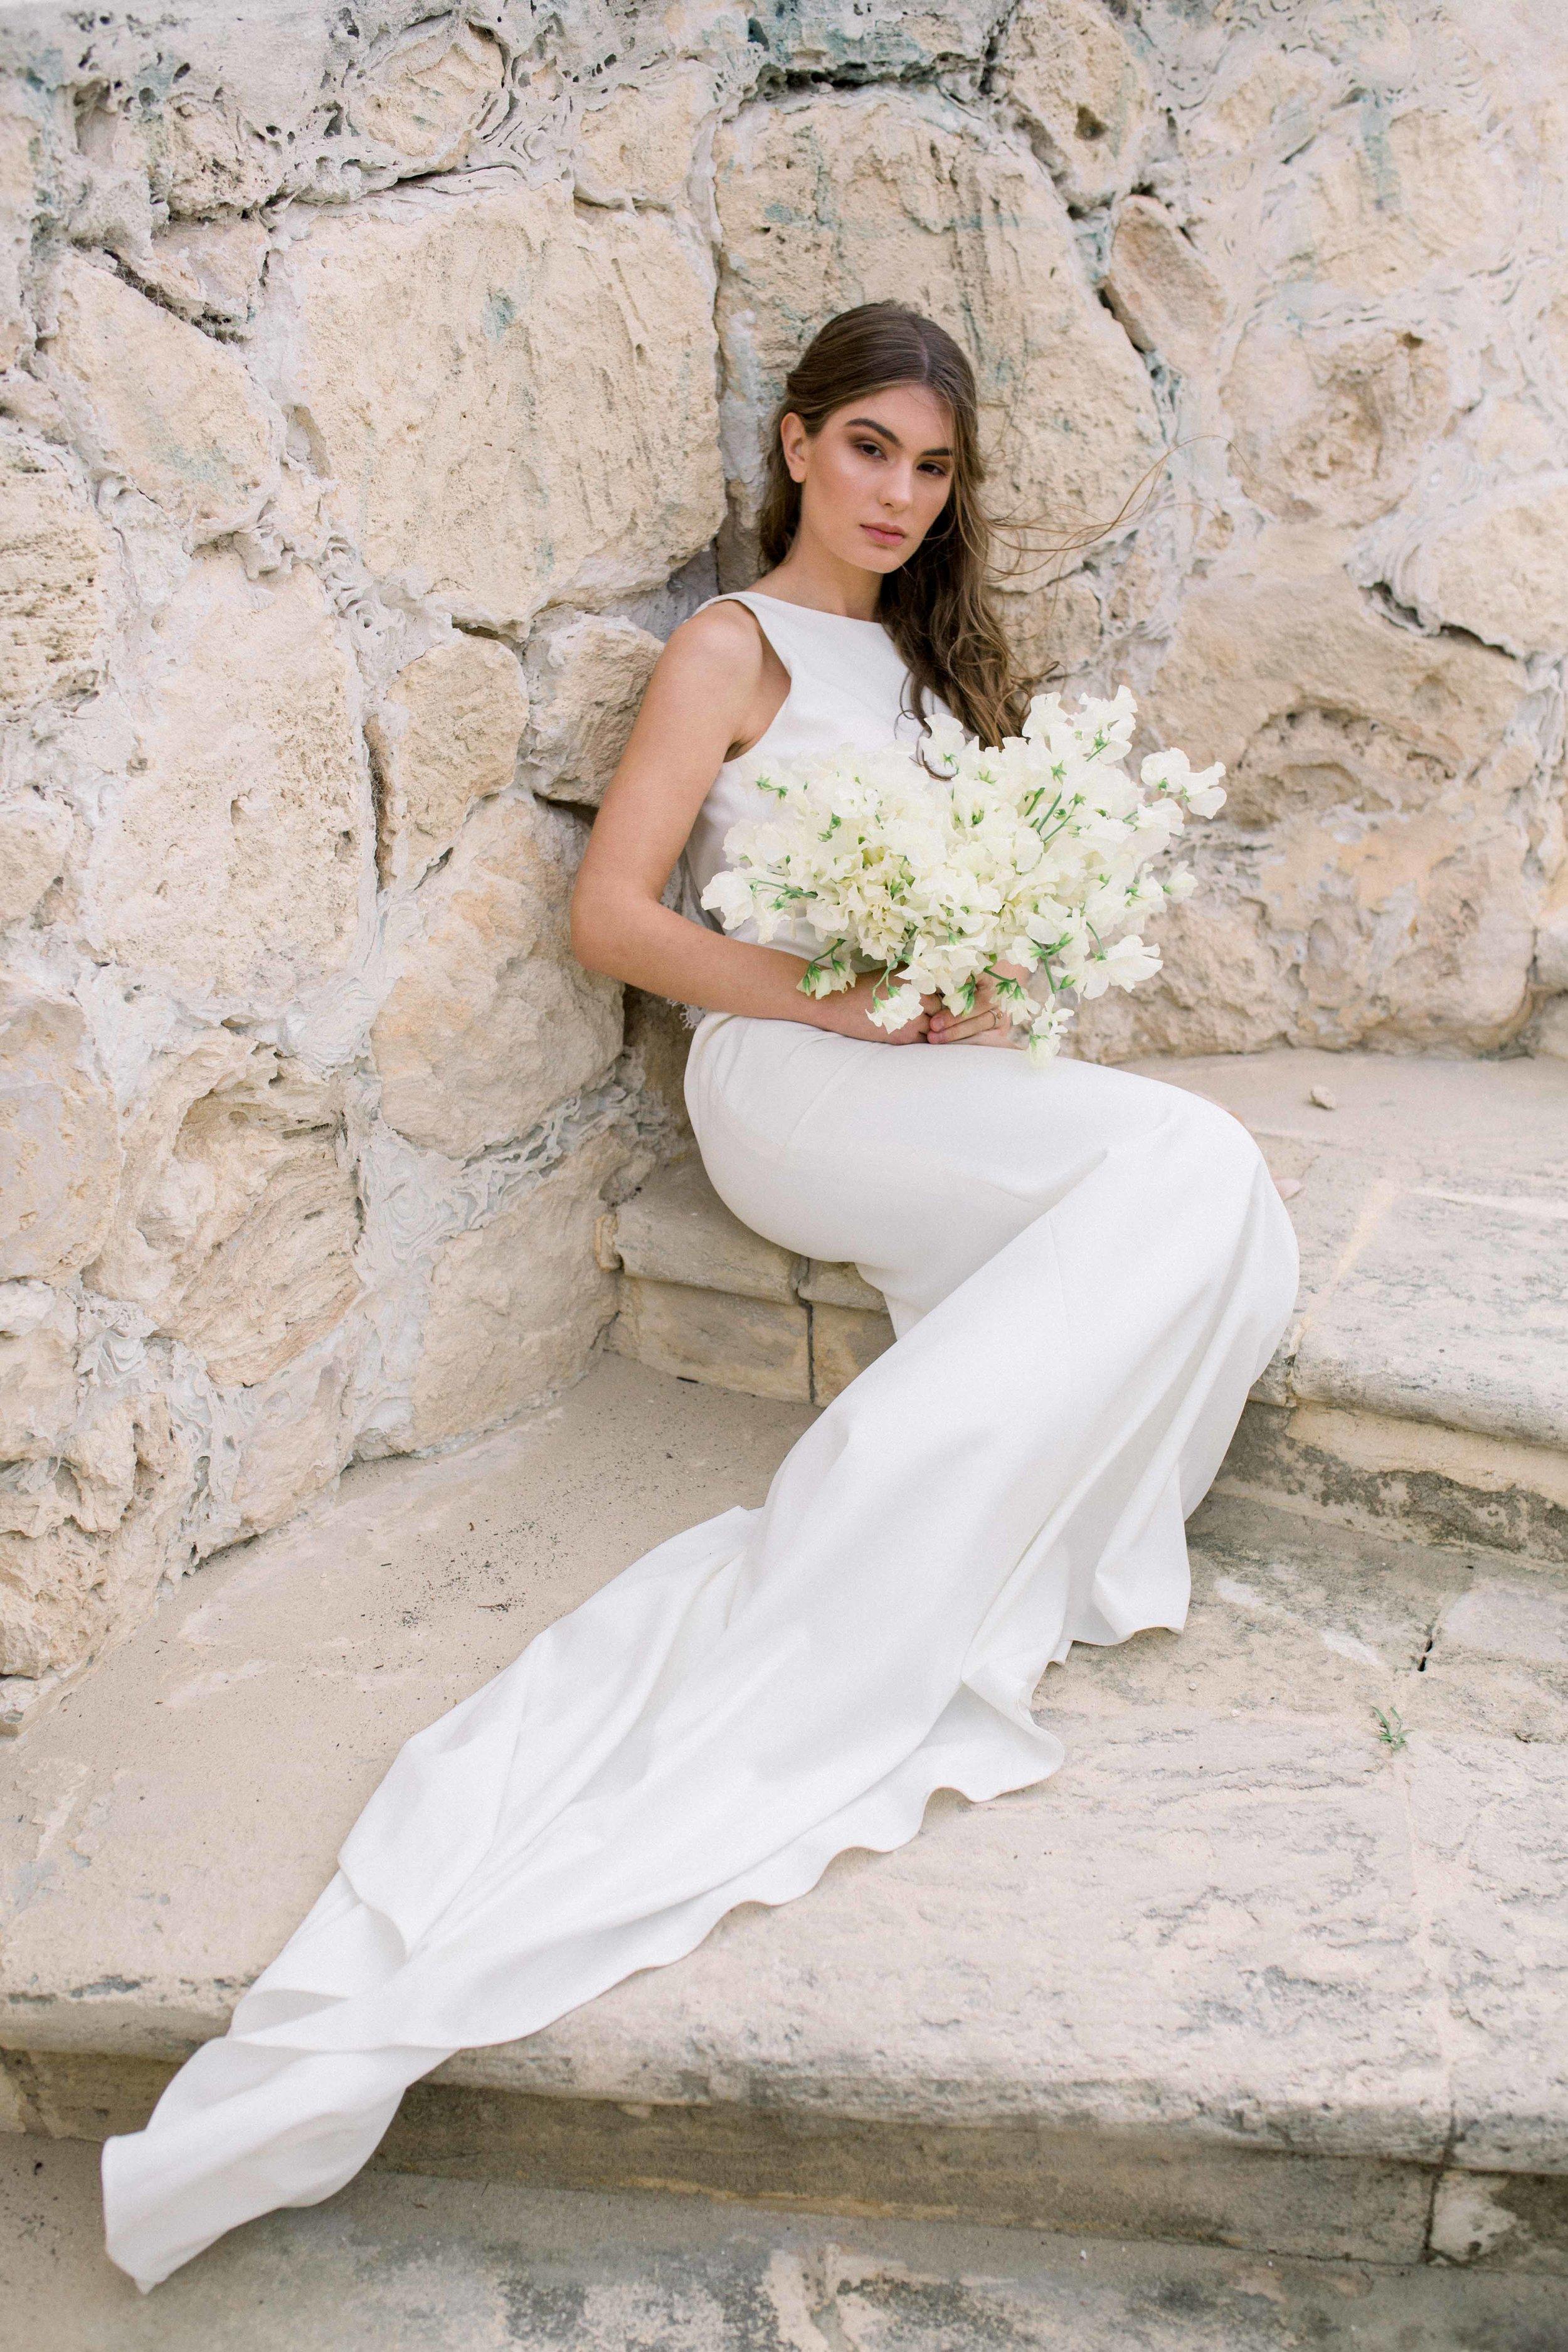 Fremantle Wedding Walk - Blue HQ, Perth Wedding Venue -  Tessa Kit Photography -JQ9A9037.jpg